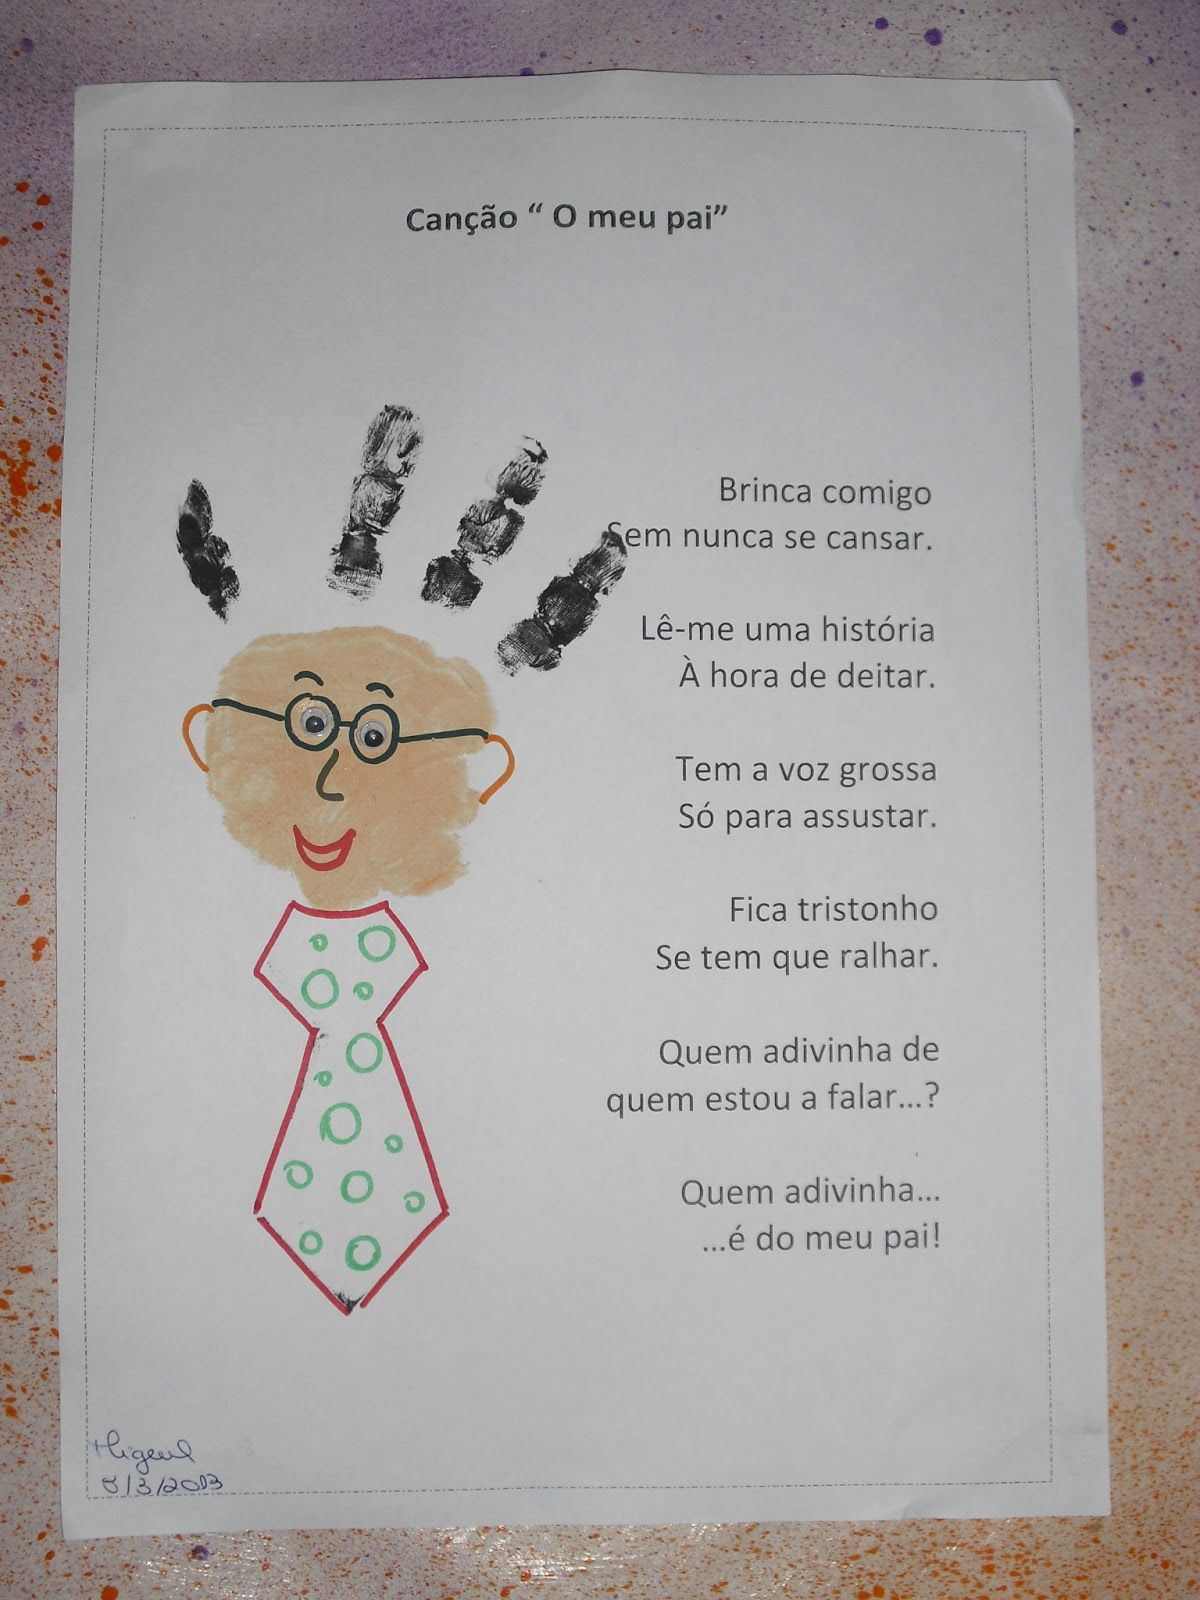 Pin Doa Yary Medina Em Papà Y Mamá Pai Fathers Day Crafts E Ideas